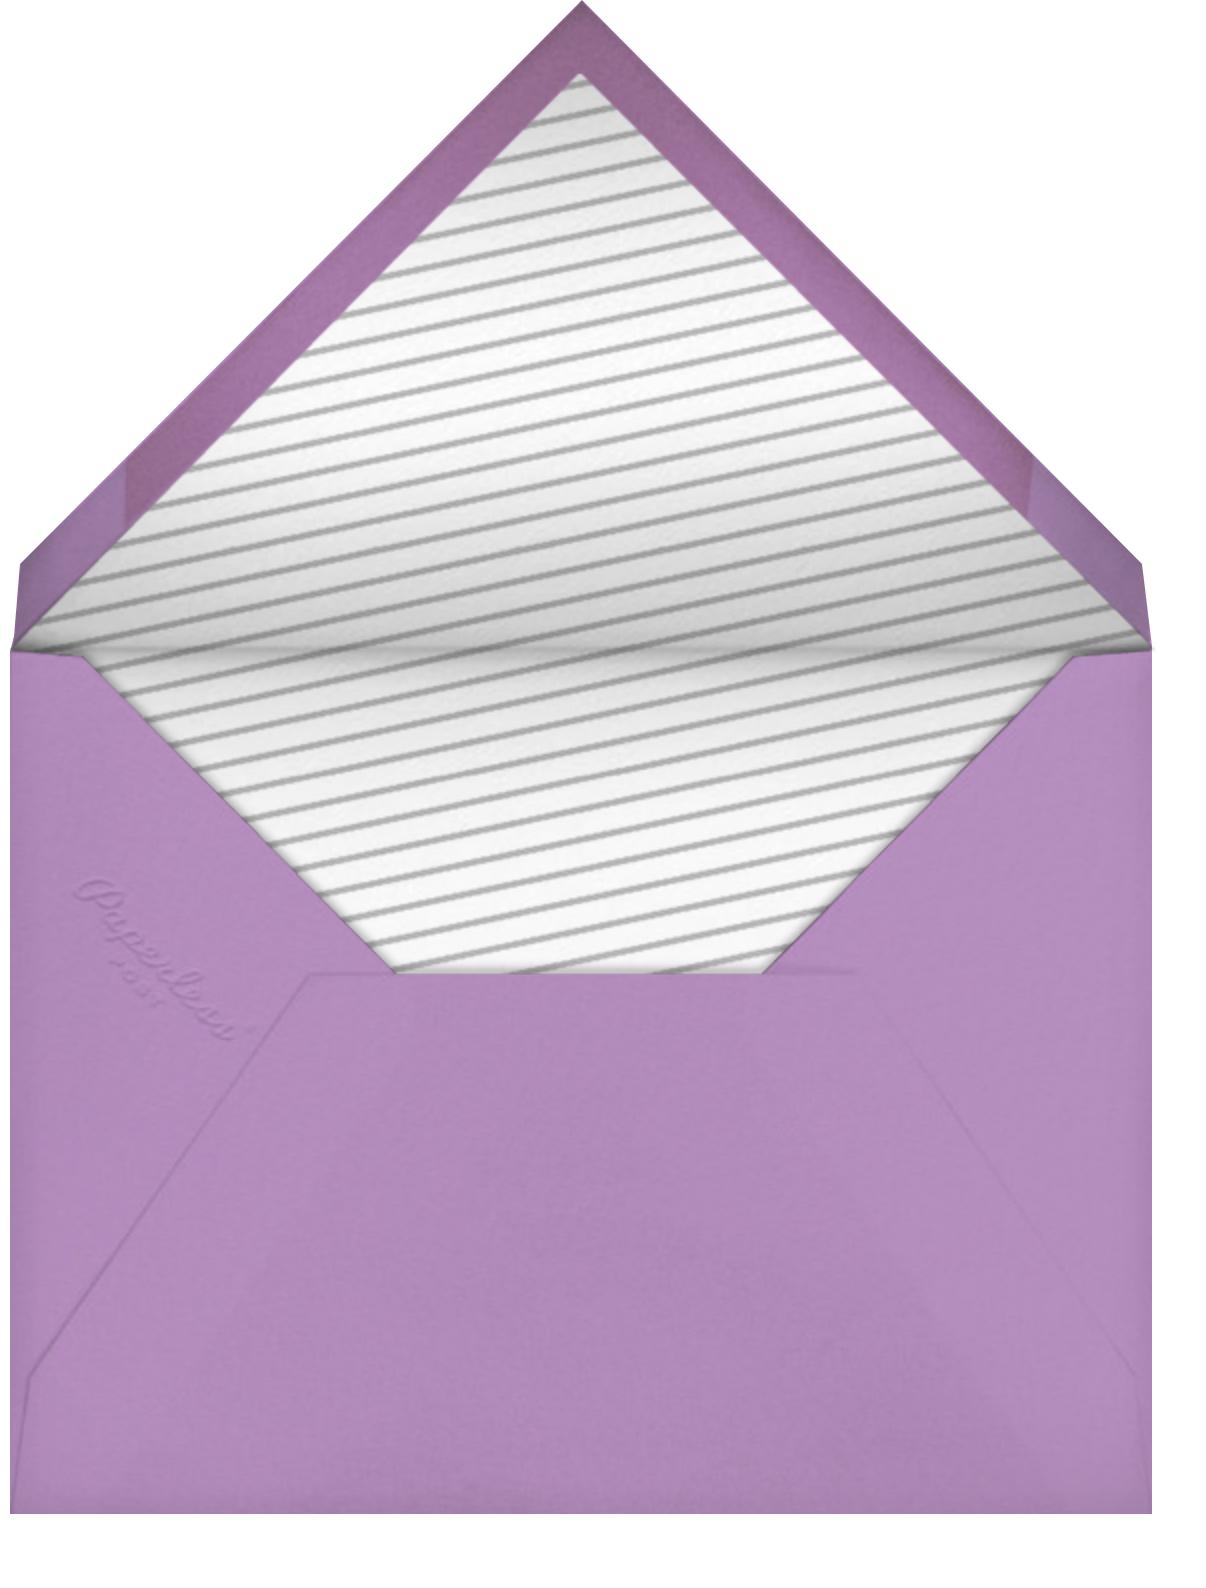 Mercer (Horizontal) - Wisteria - Paperless Post - General - envelope back